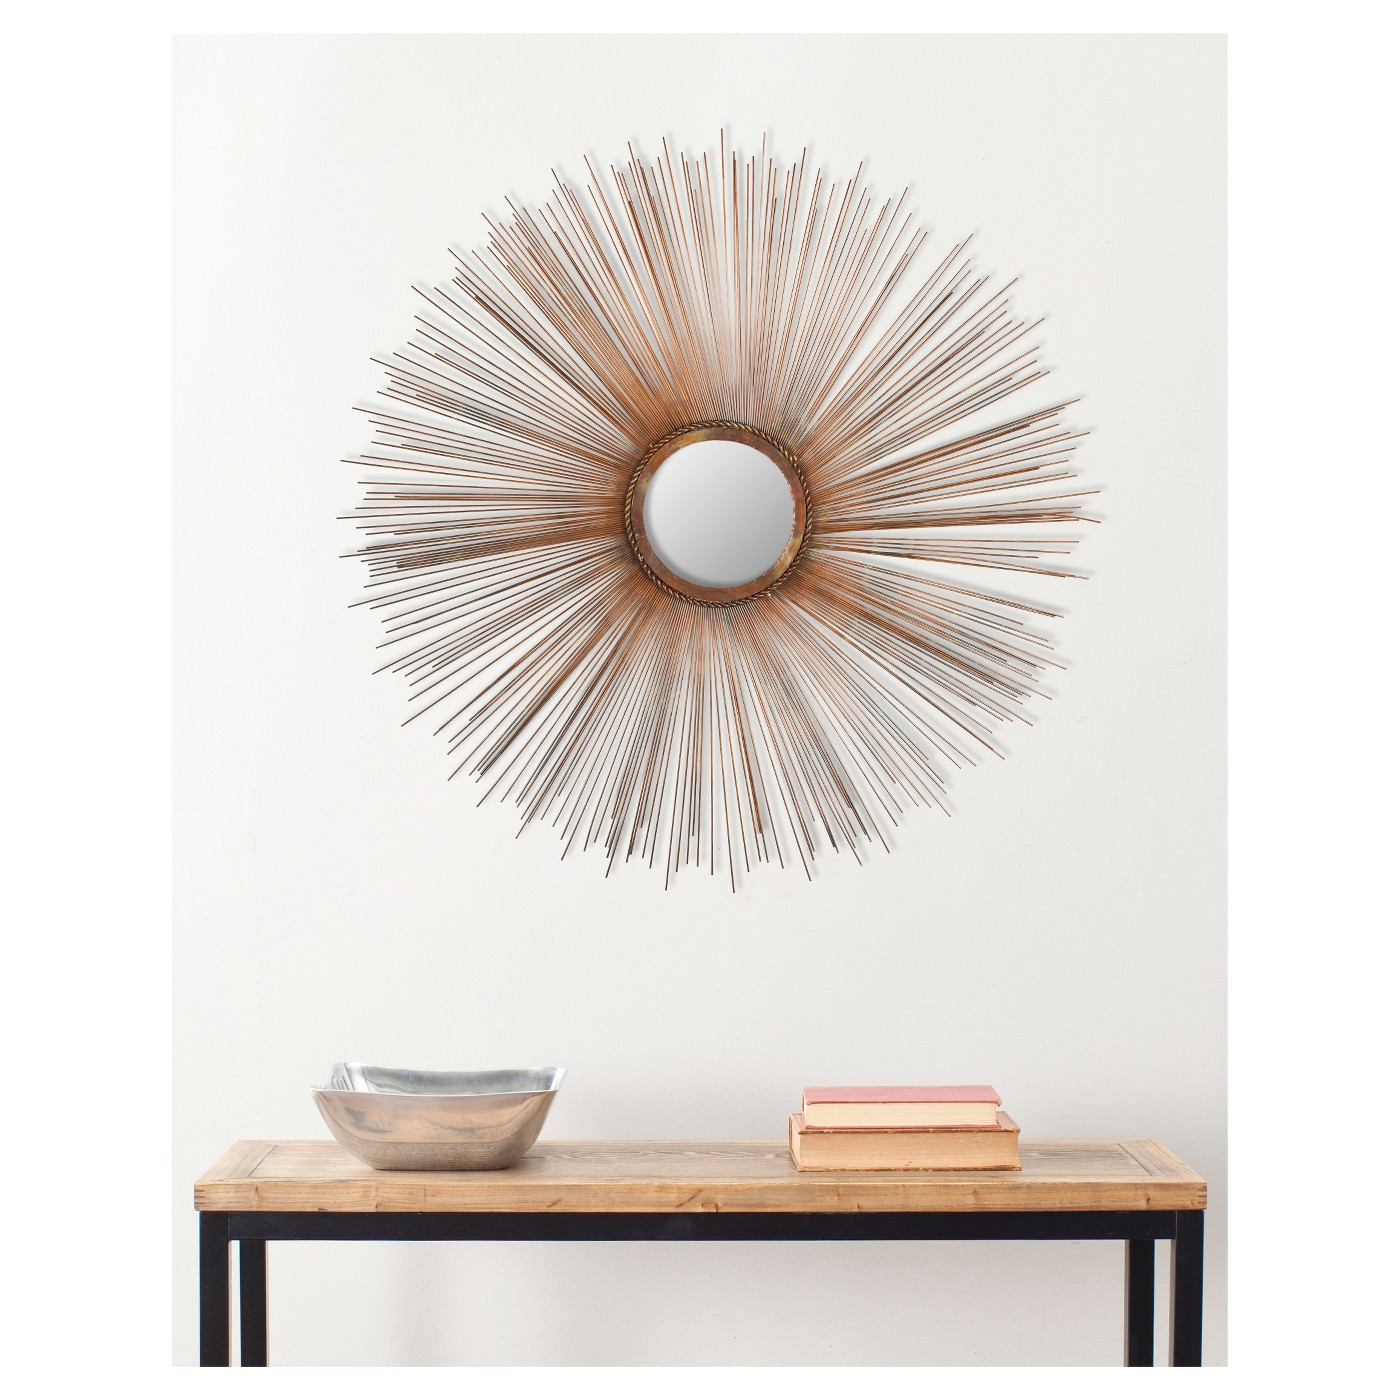 Round decorate wall mirror.